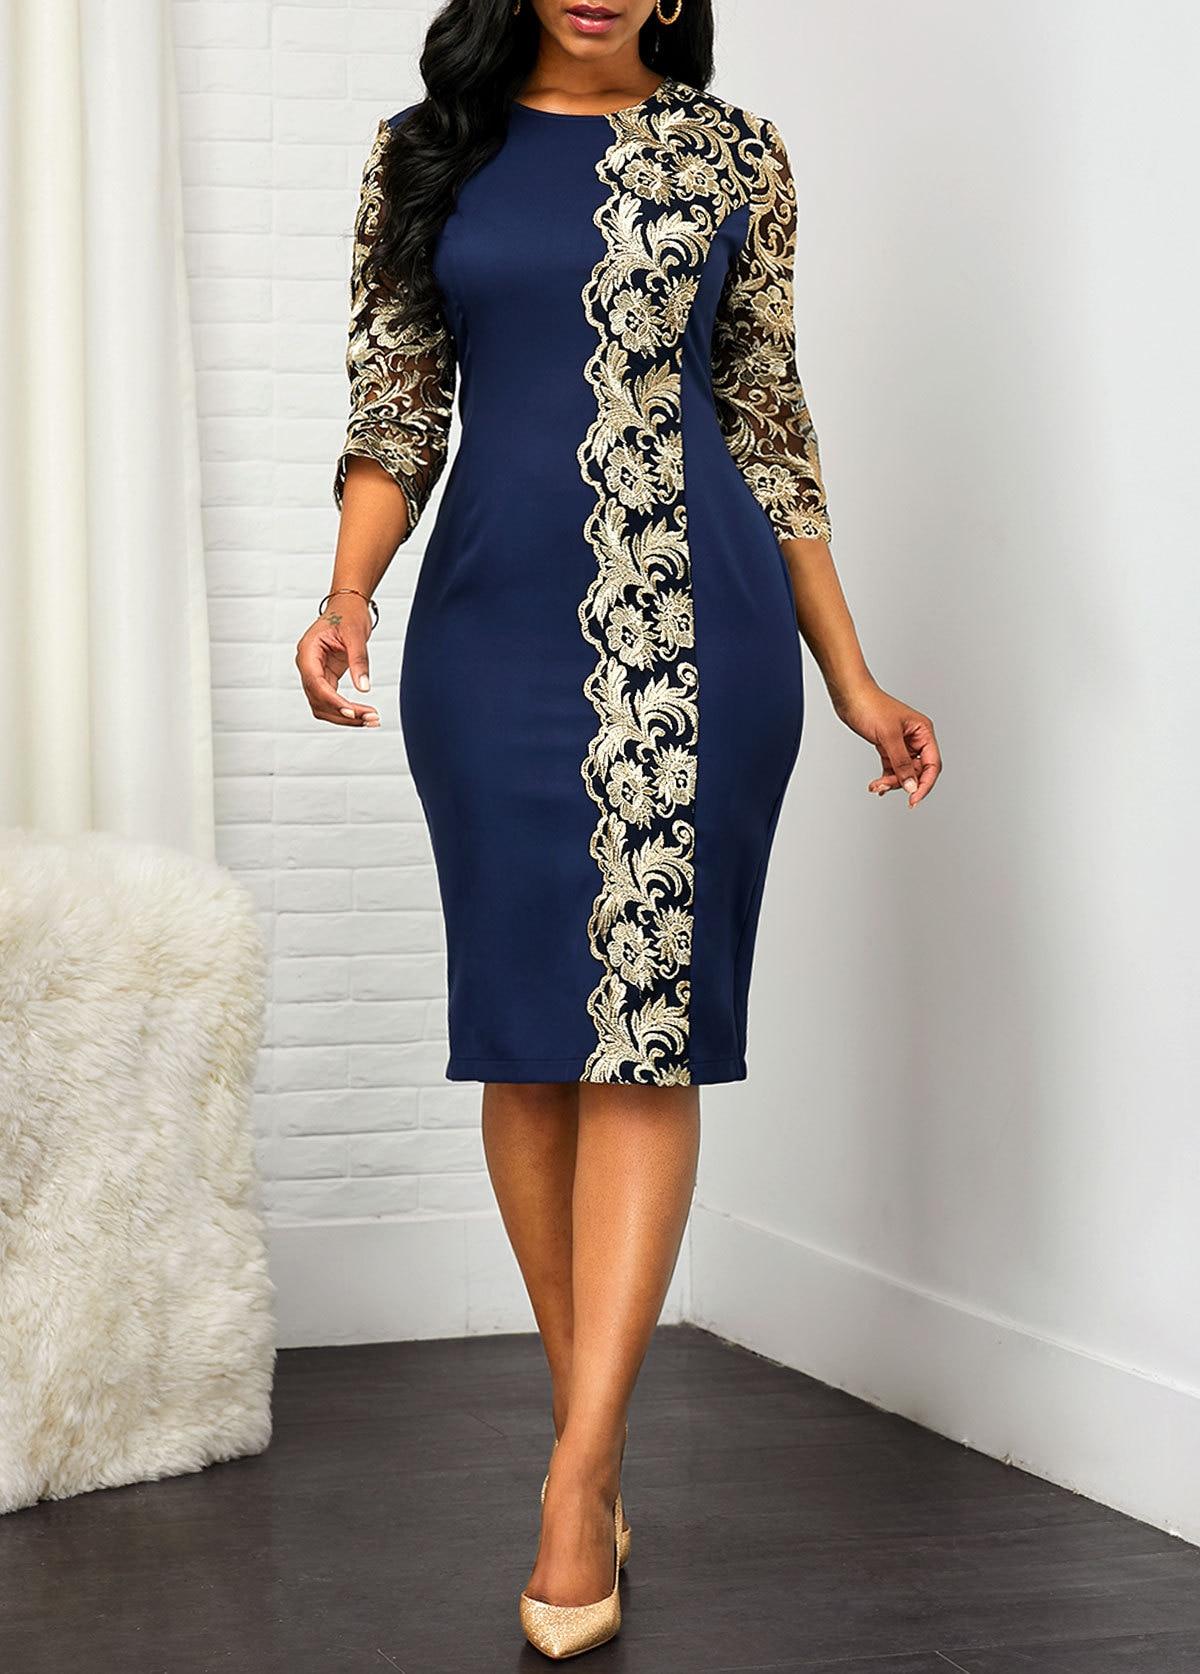 2020 Autumn Dress Office O-neck Lace Patch Slim Seven-point Sleeve Pencil Bag Hip Dress Ladies Casual Loose Large Size Dress 5XL